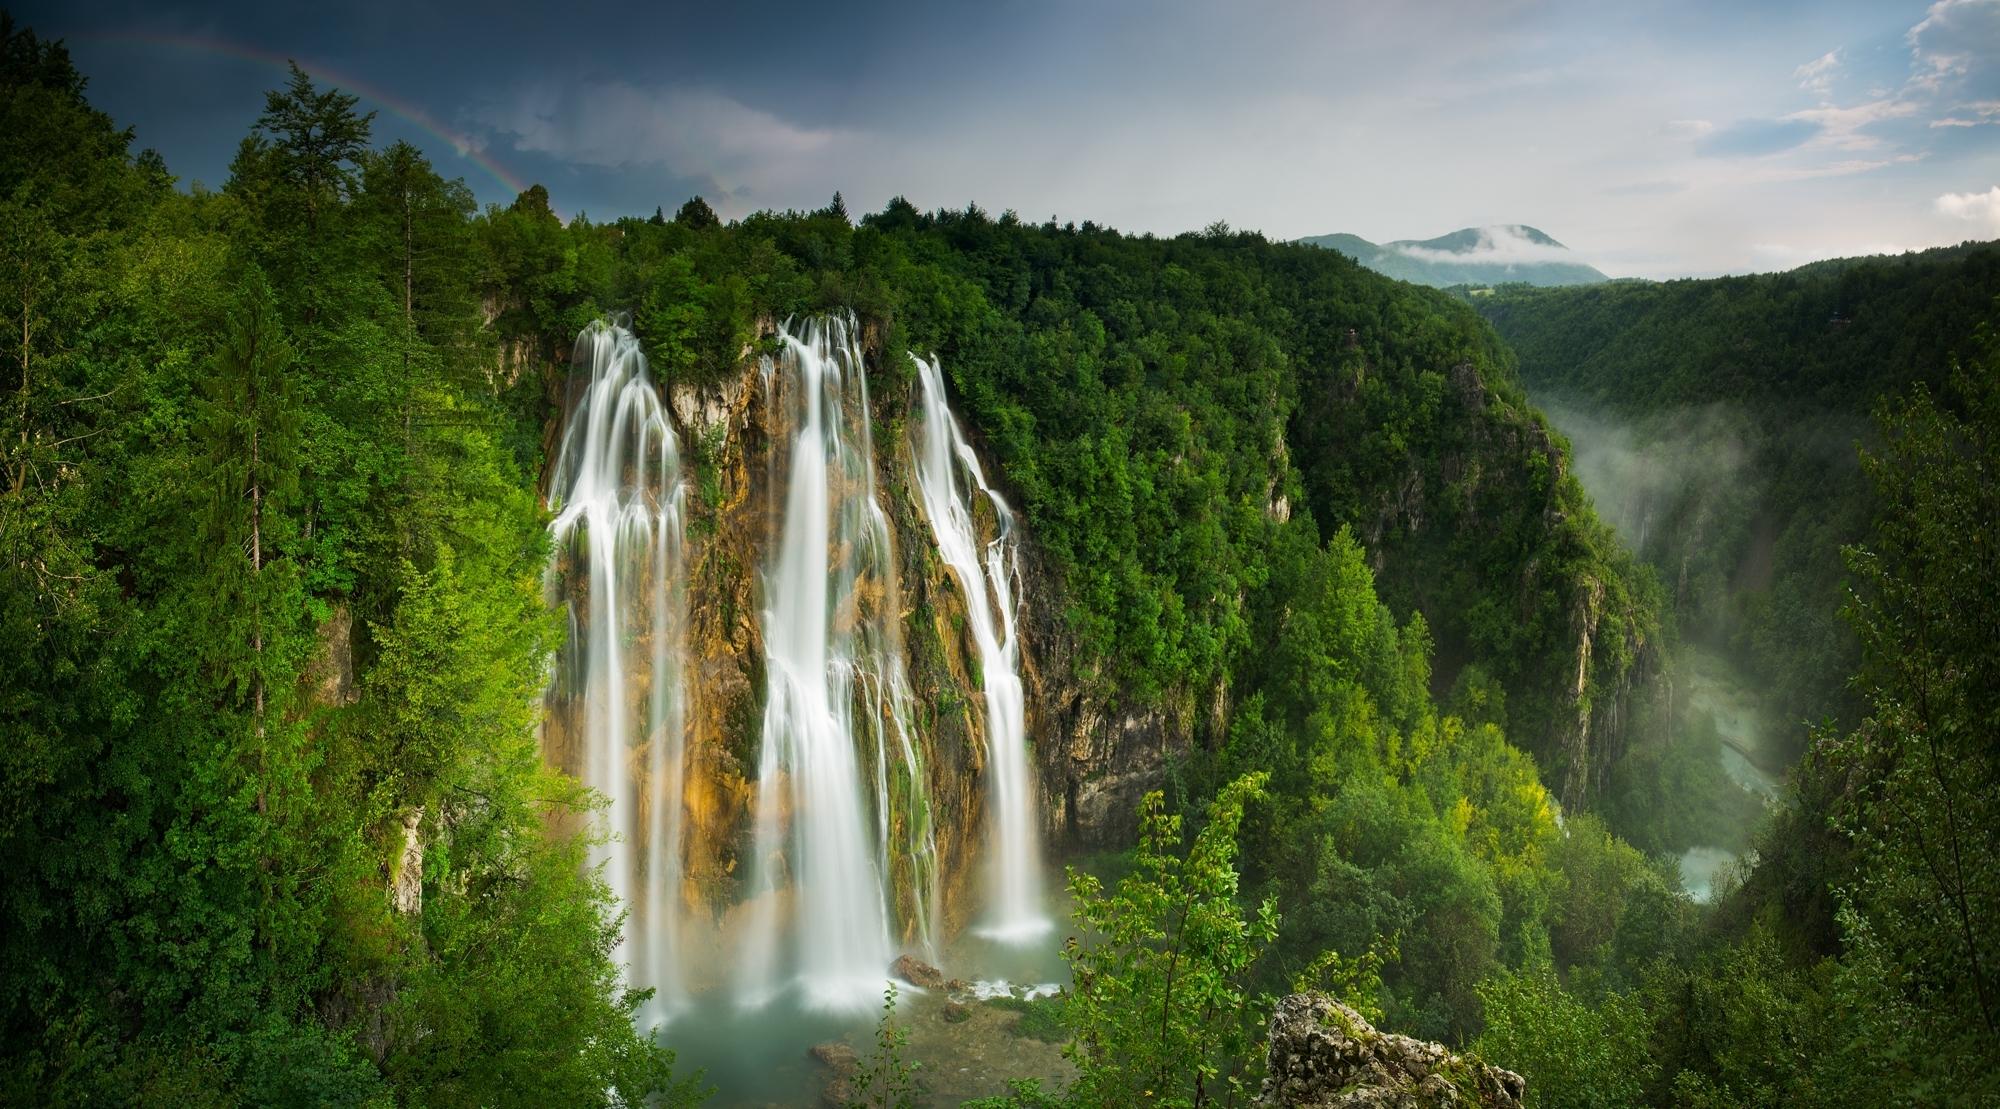 обои лесной водопад вносит доработку